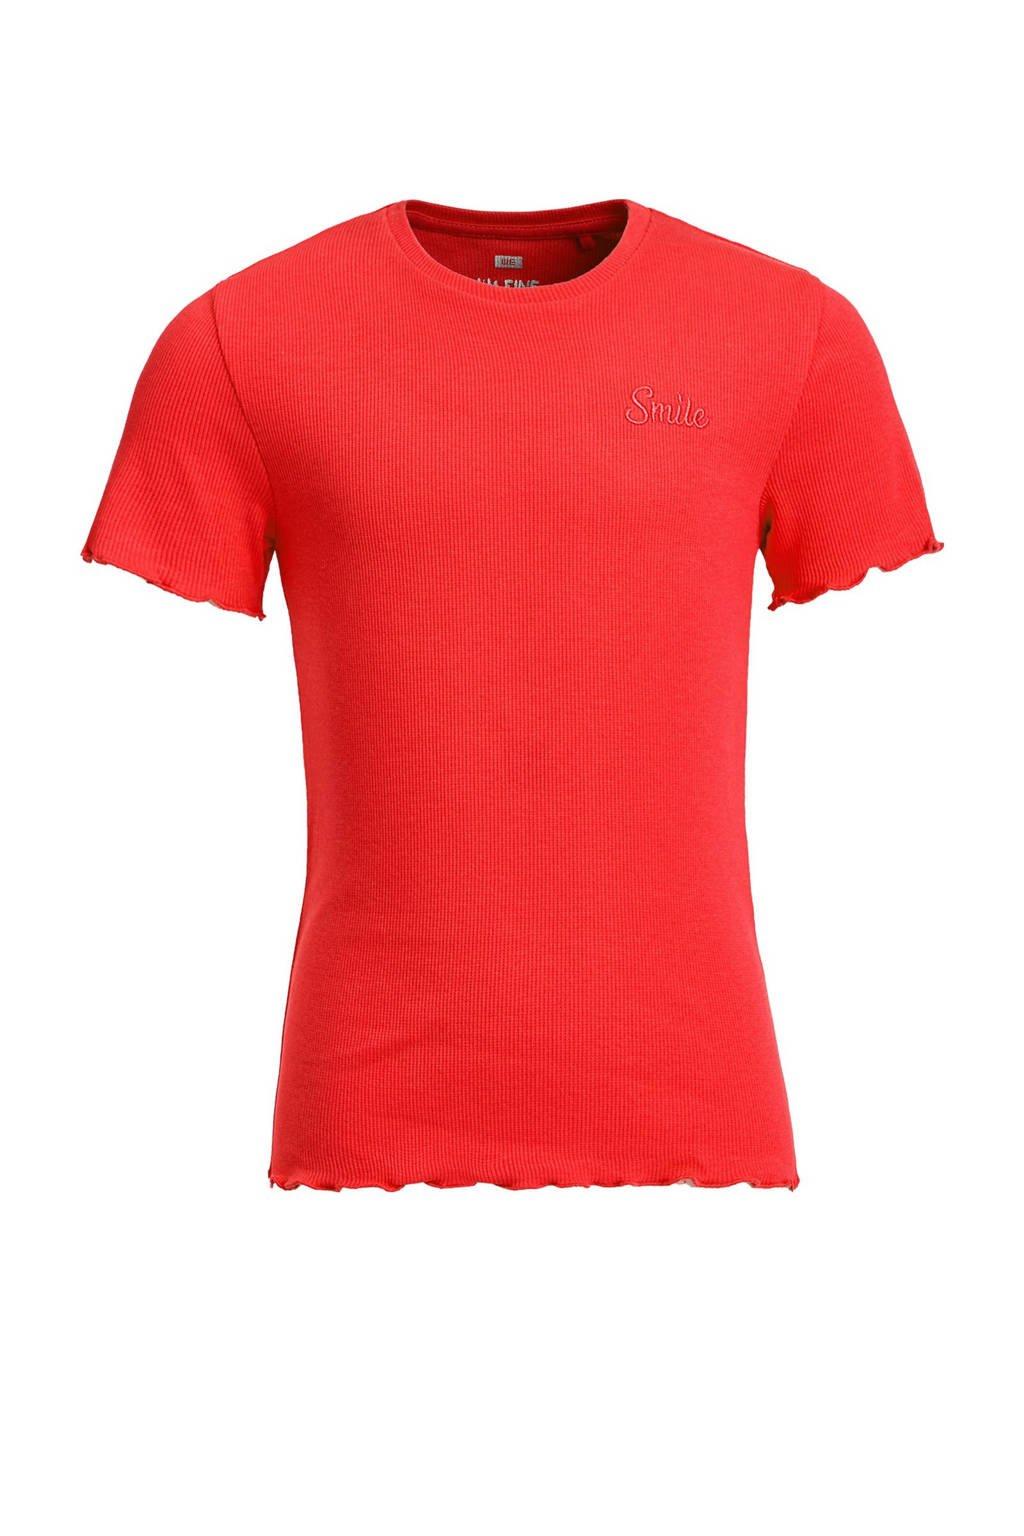 WE Fashion ribgebreid T-shirt met borduursels rood, Rood